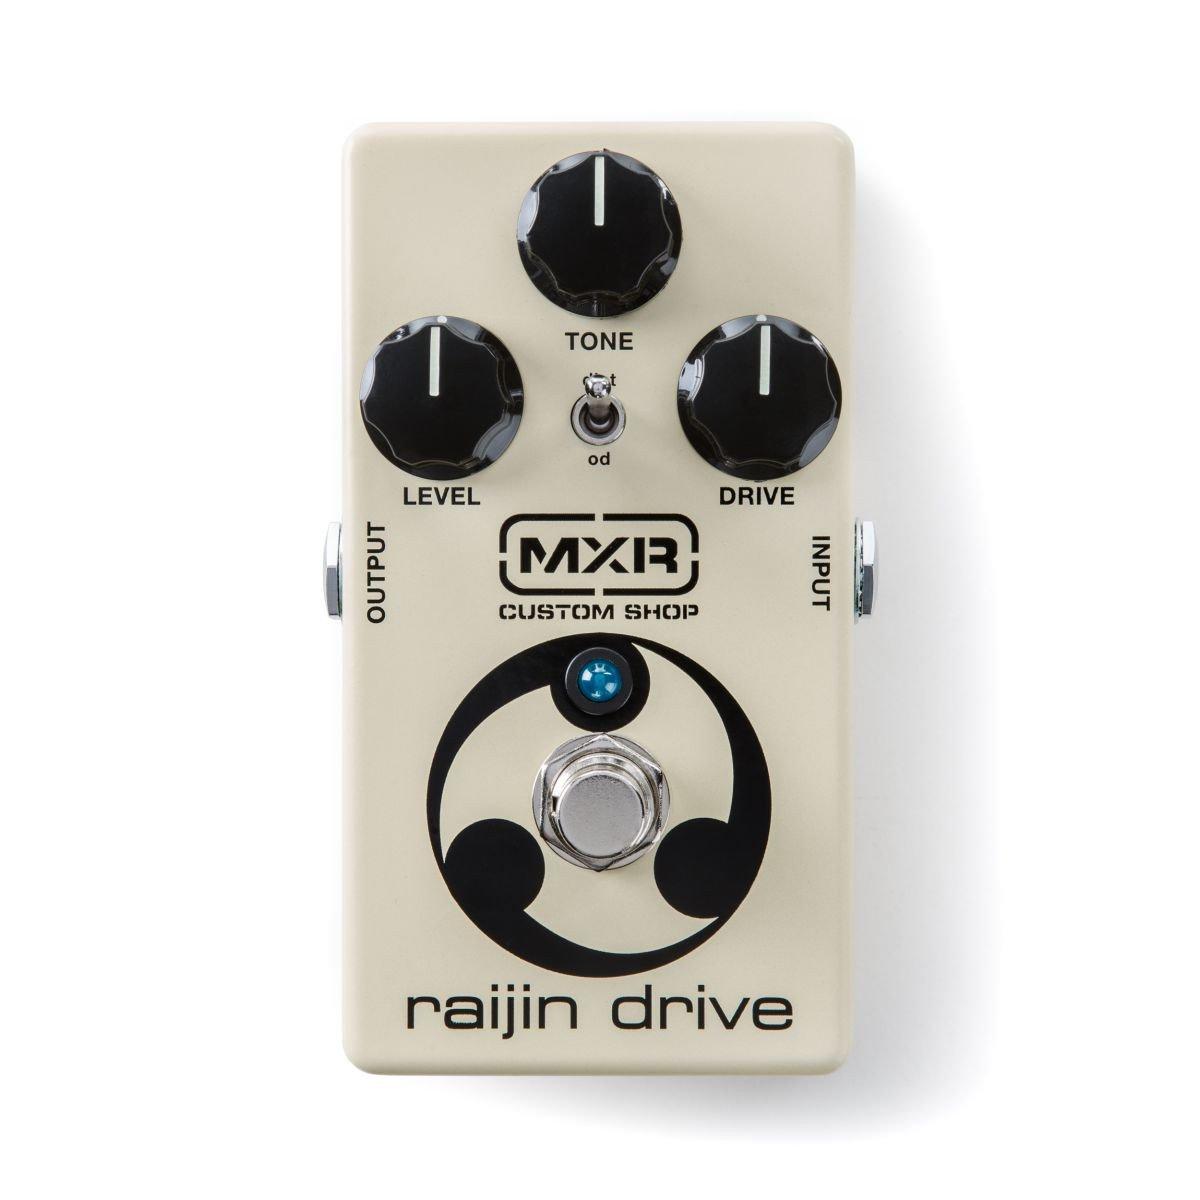 MXR CSP037 RAIJIN DRIVE - Chitarre Effetti - Overdrive